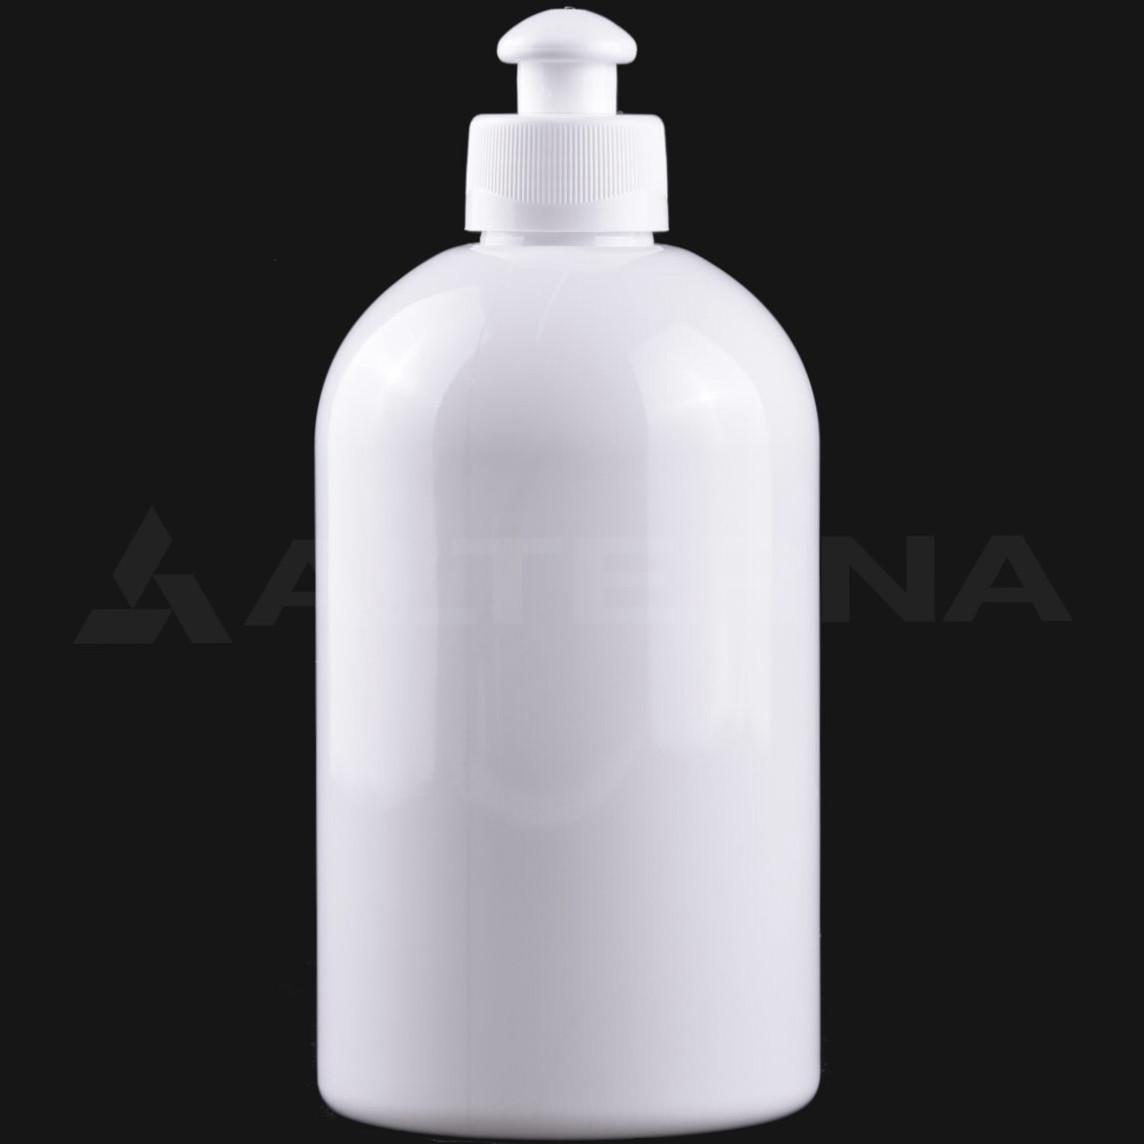 500 ml PET Bottle with 28 mm Push Pull Cap